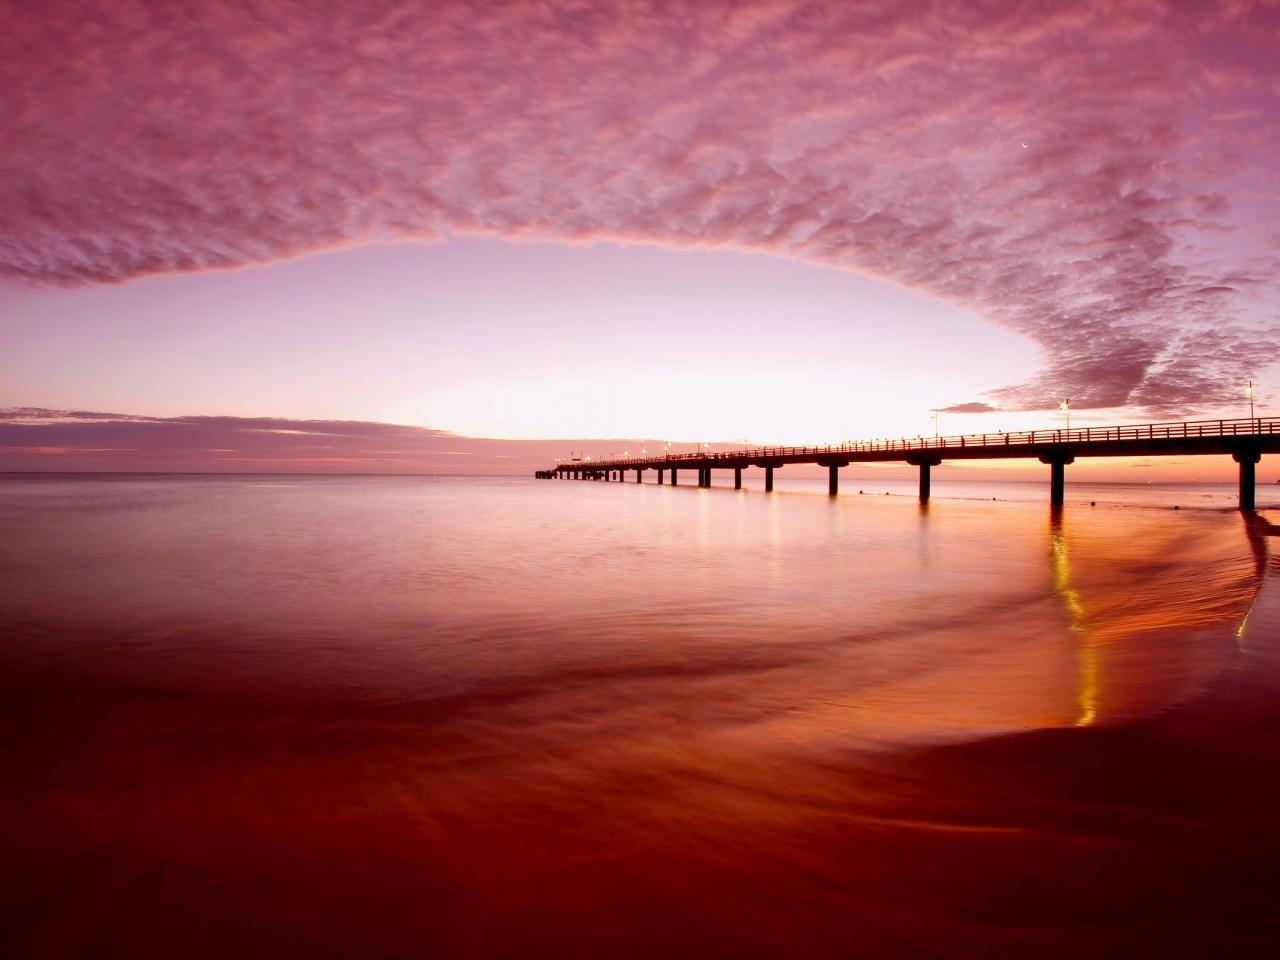 Cielo rosado - 1280x960